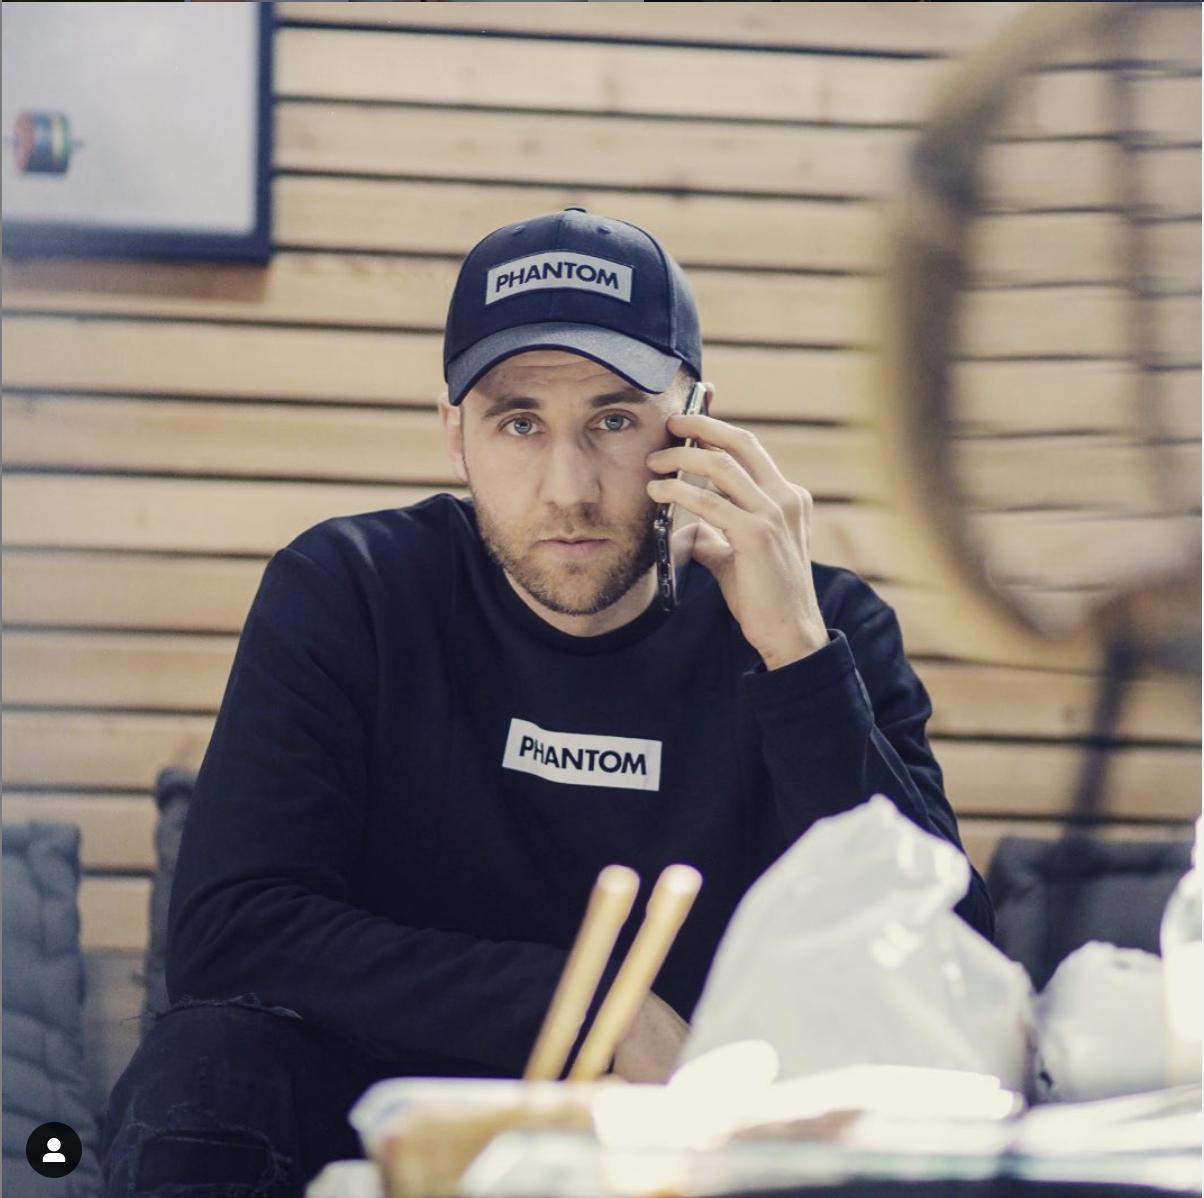 Salzburg Entrepreneur Dominique Wenger Makes Remarkable Strides with Company Phantom Athletics